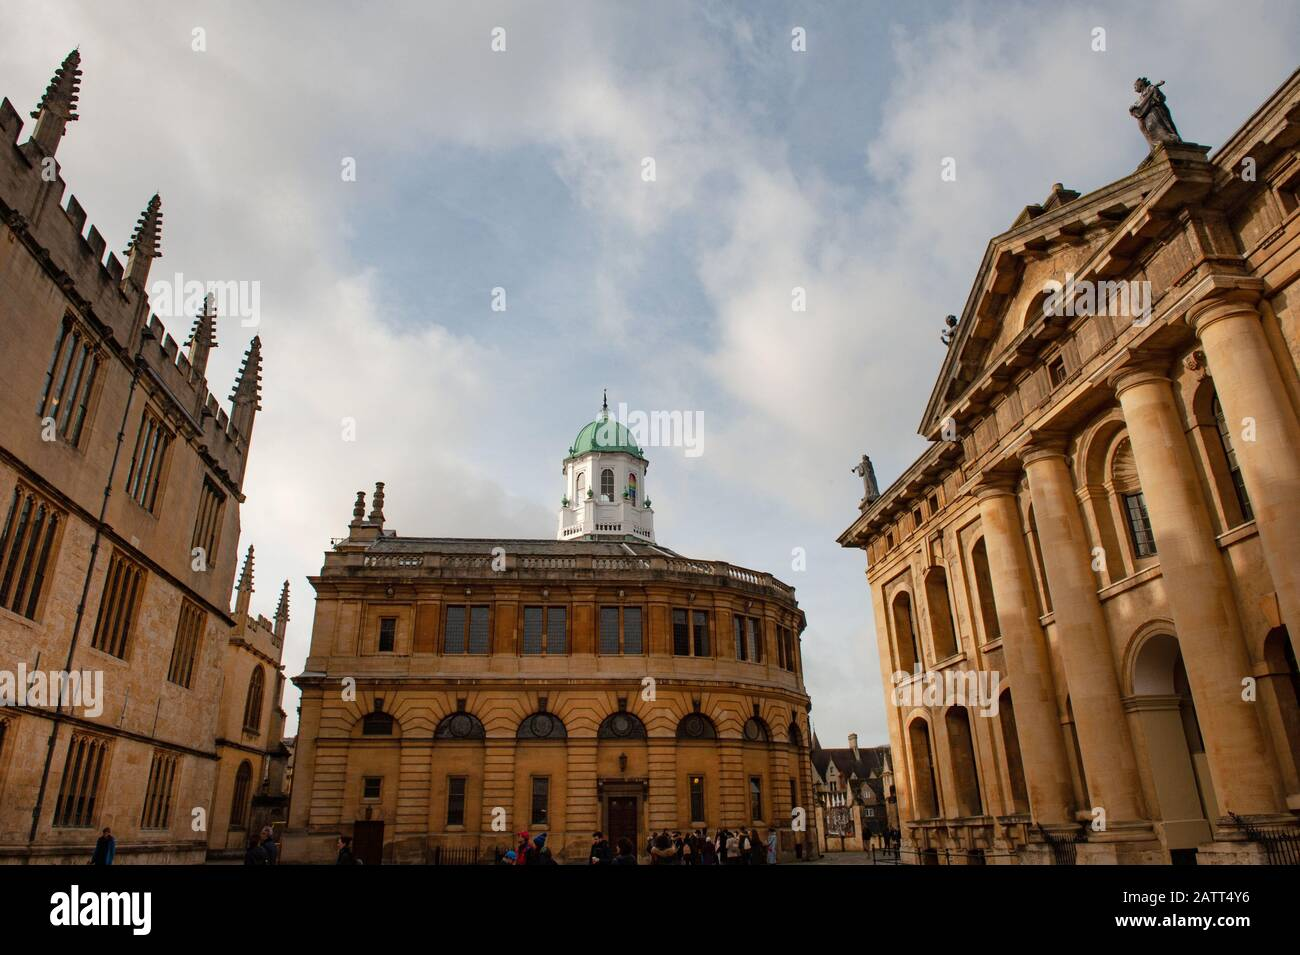 Oxford, England, UK. February 2nd, 2020 The Sheldonian Theatre, Broad Street, Oxford University. Stock Photo